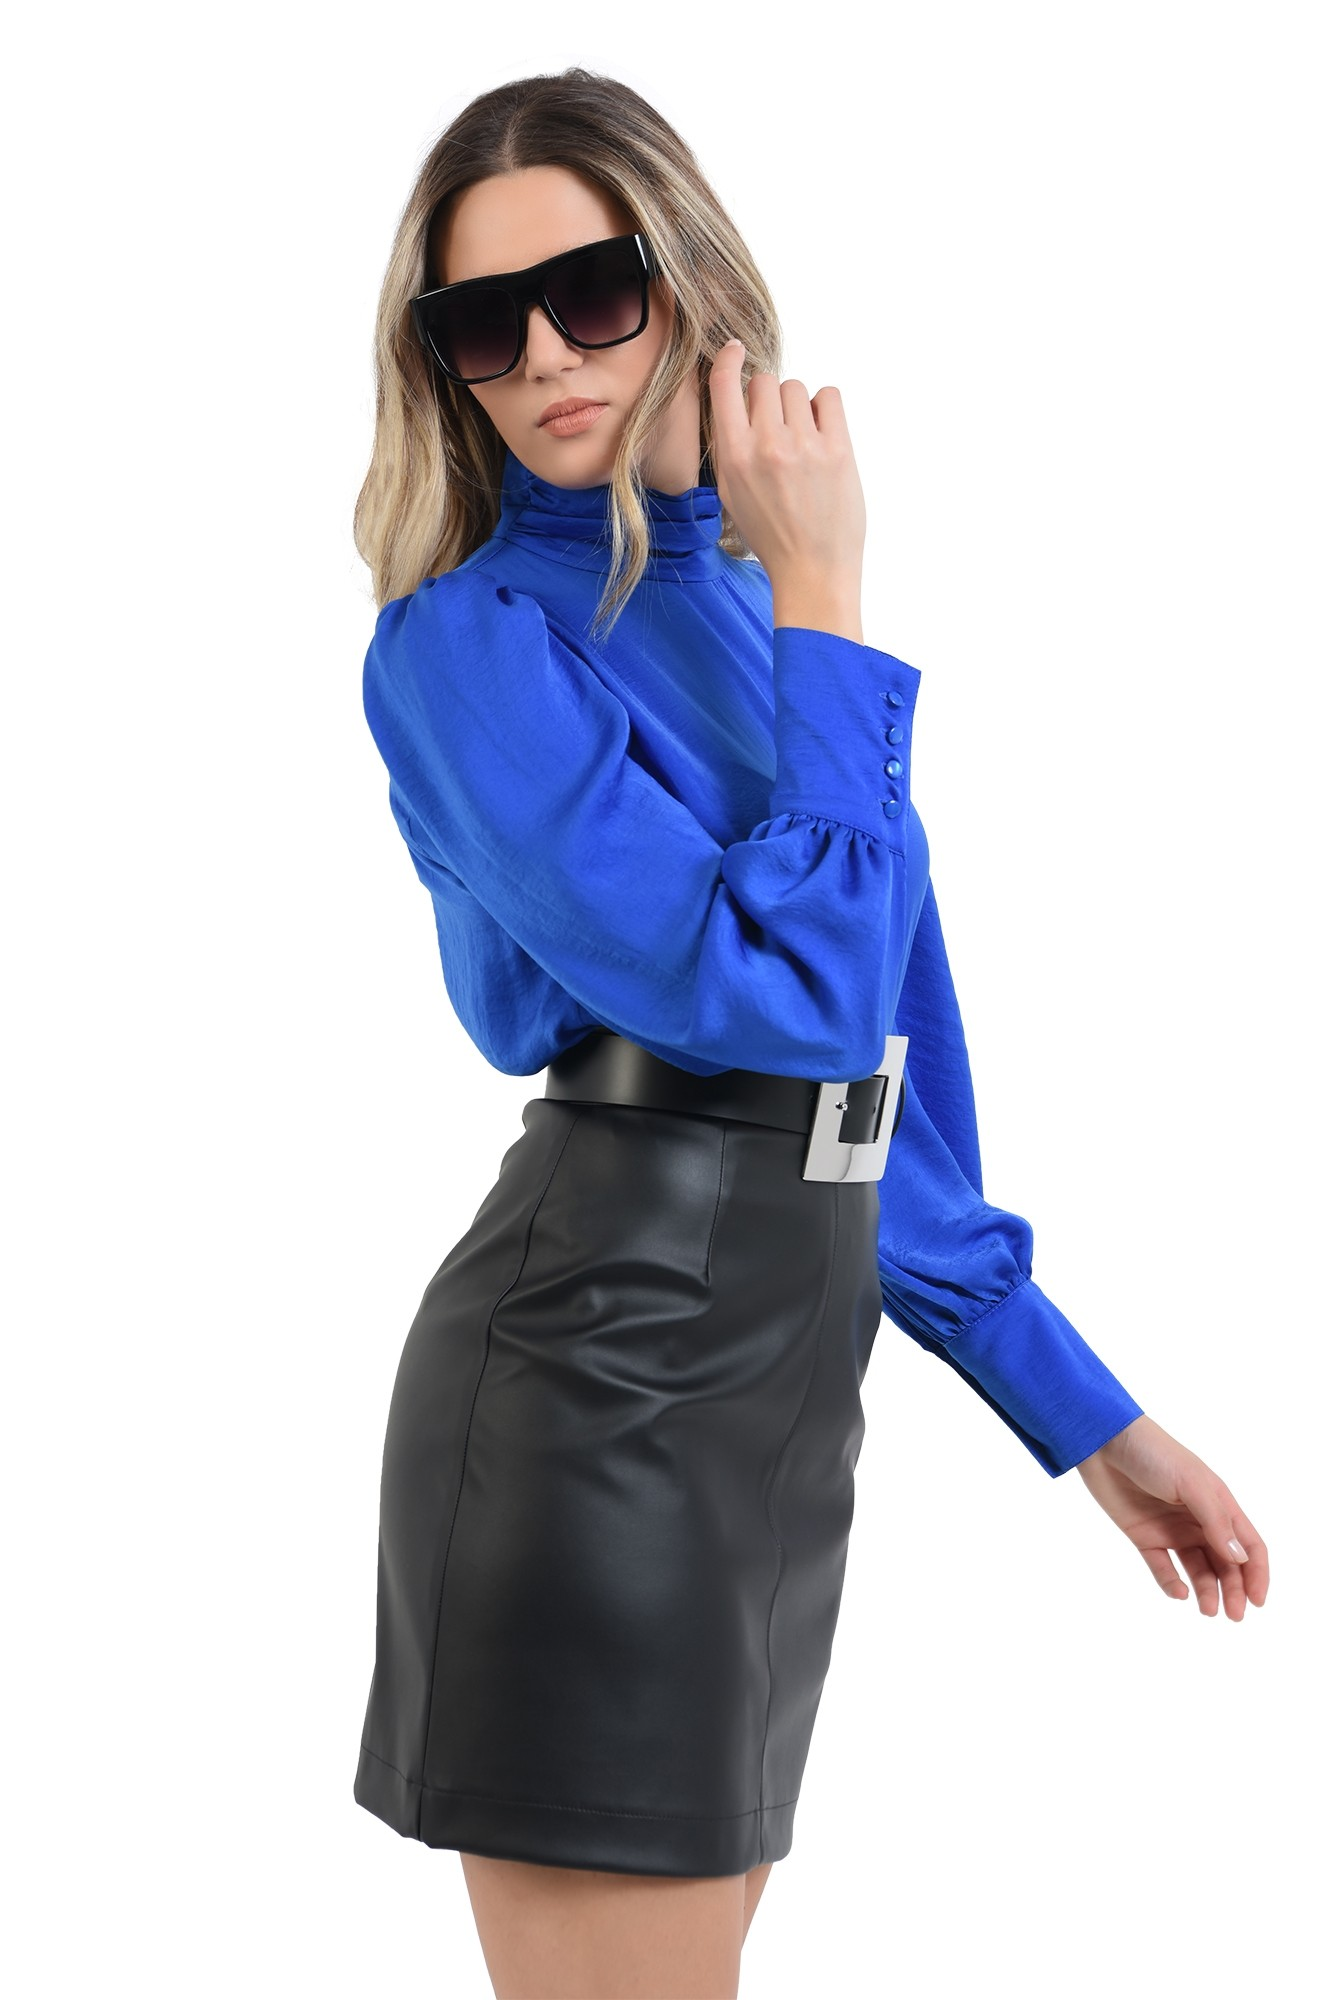 3 - 360 - bluza cu pliuri la gat, albastra, cu nasturi la manseta